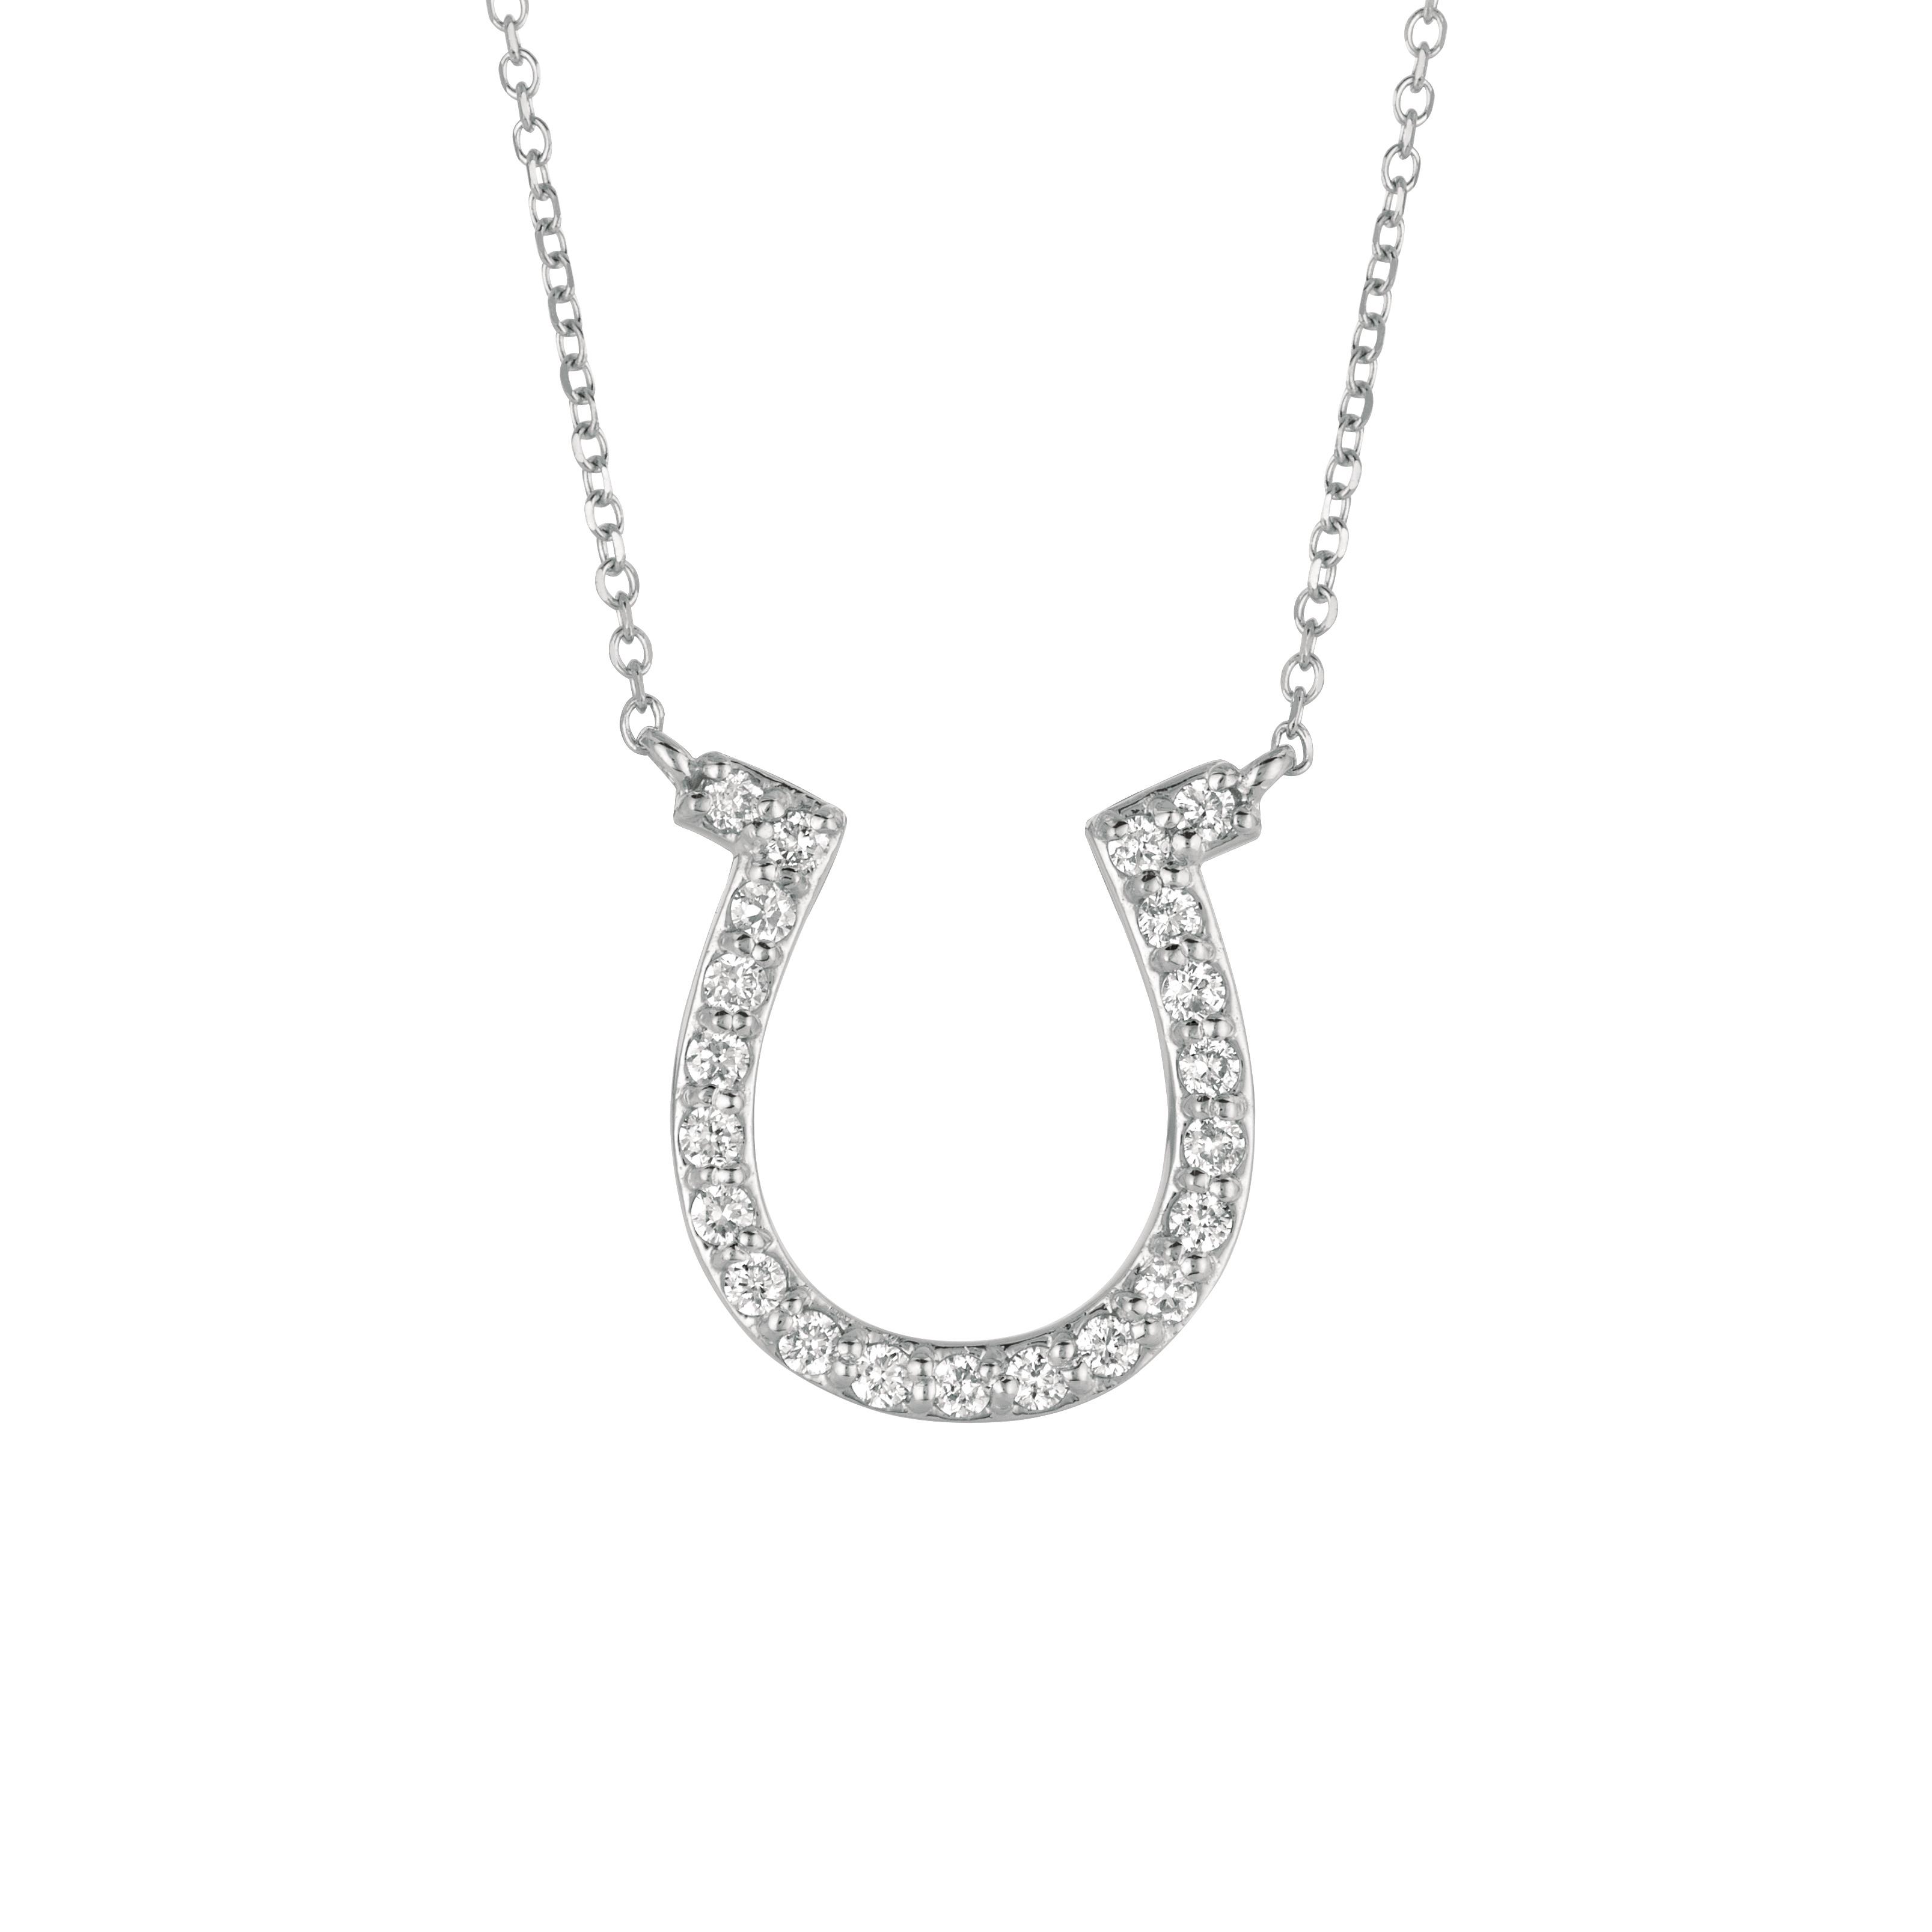 0 25 Ct Diamond Horseshoe Necklace Set In 14k White Gold Idjn 25wd